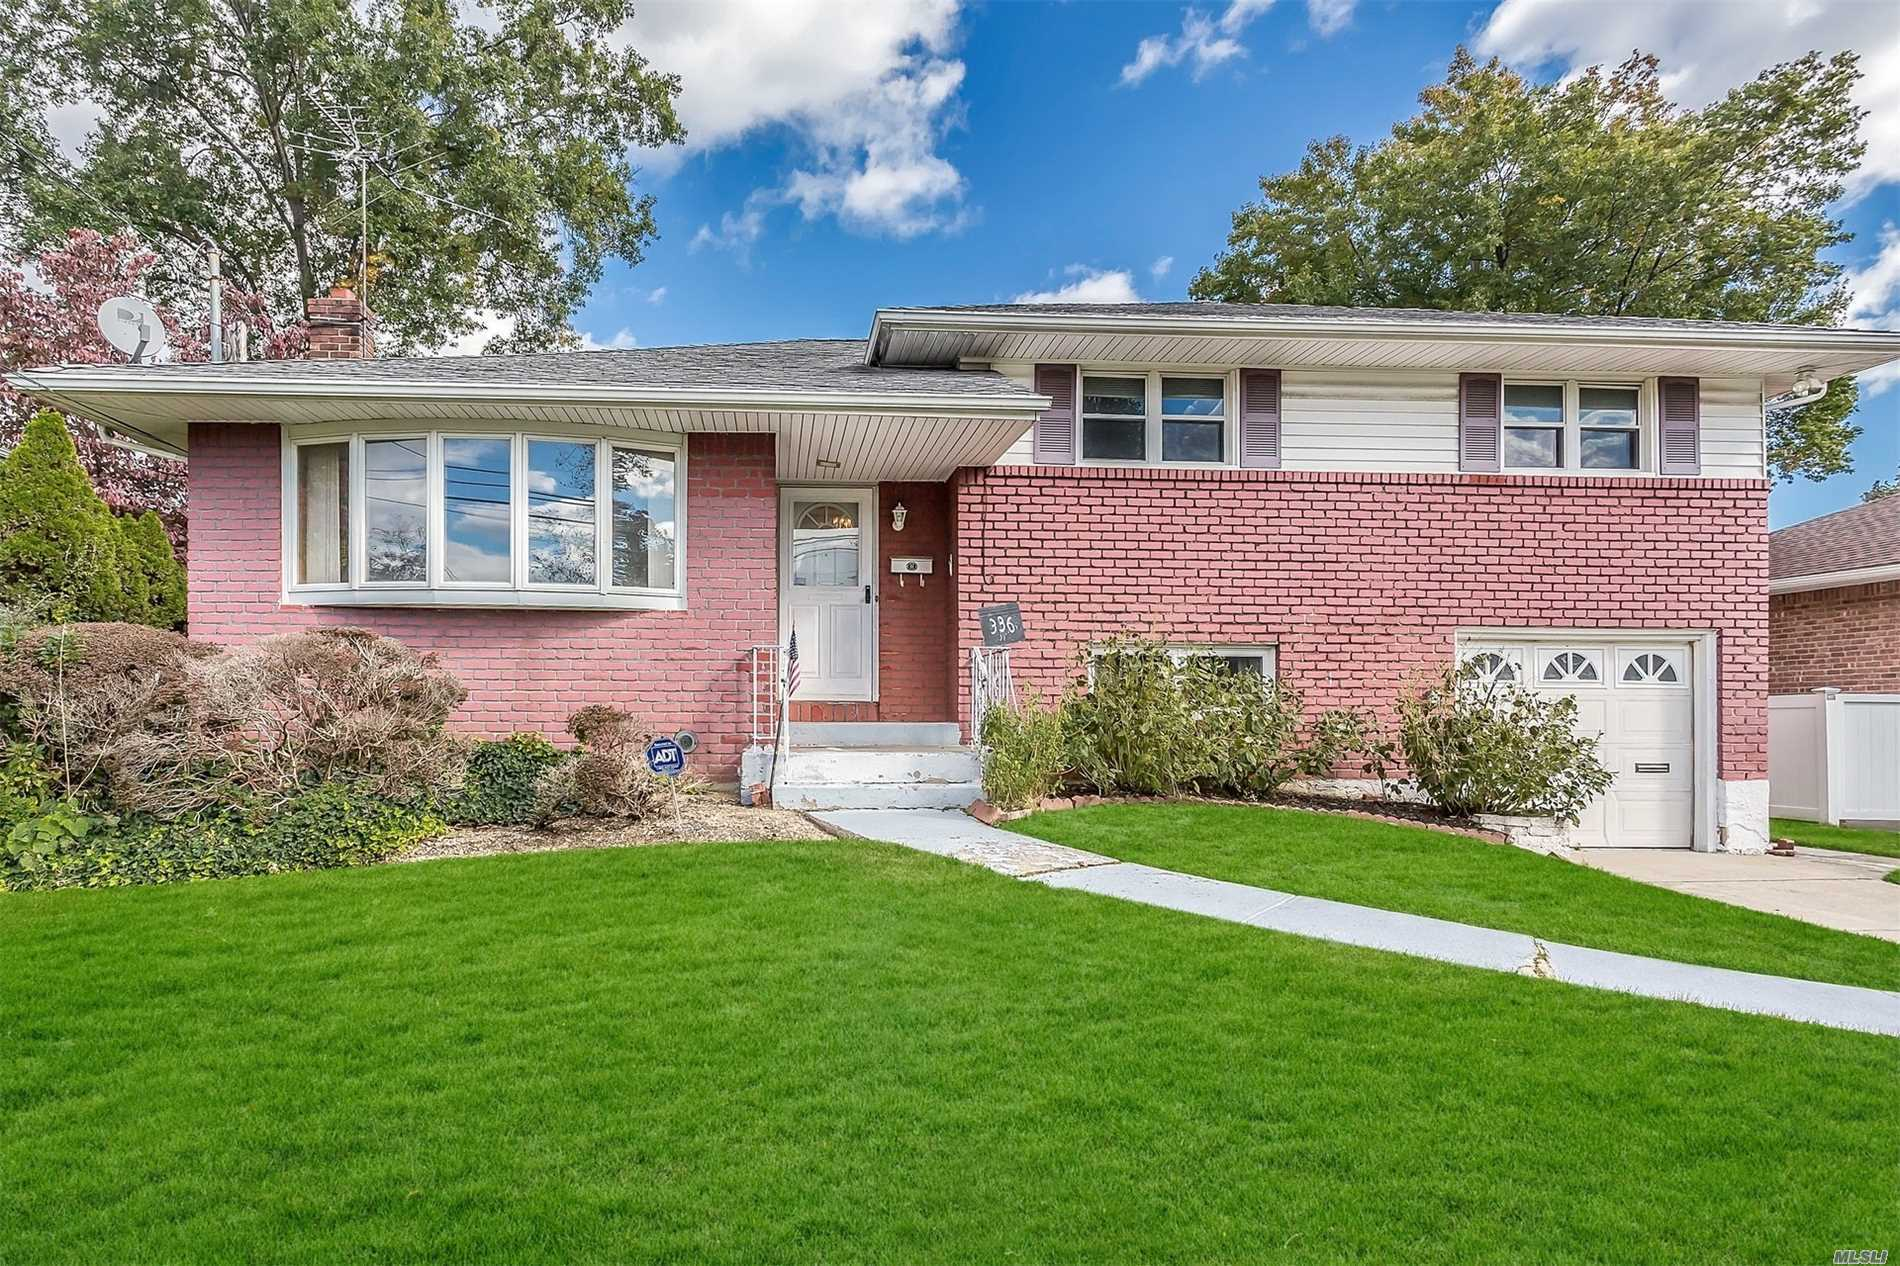 336 Brompton Rd - Garden City S., New York